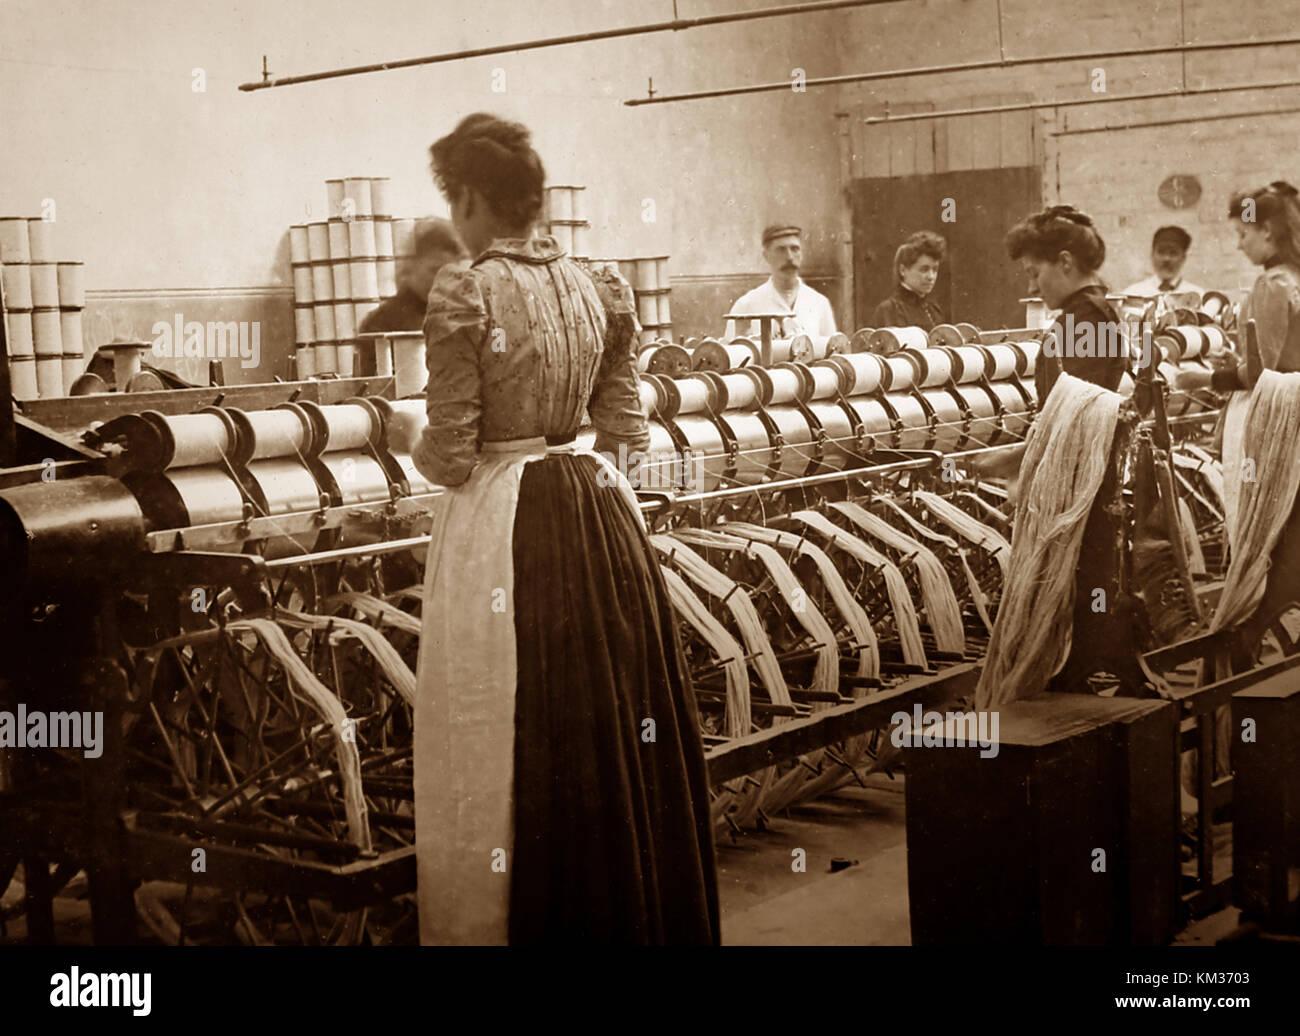 Warp winding machine, linen production, Victorian period - Stock Image